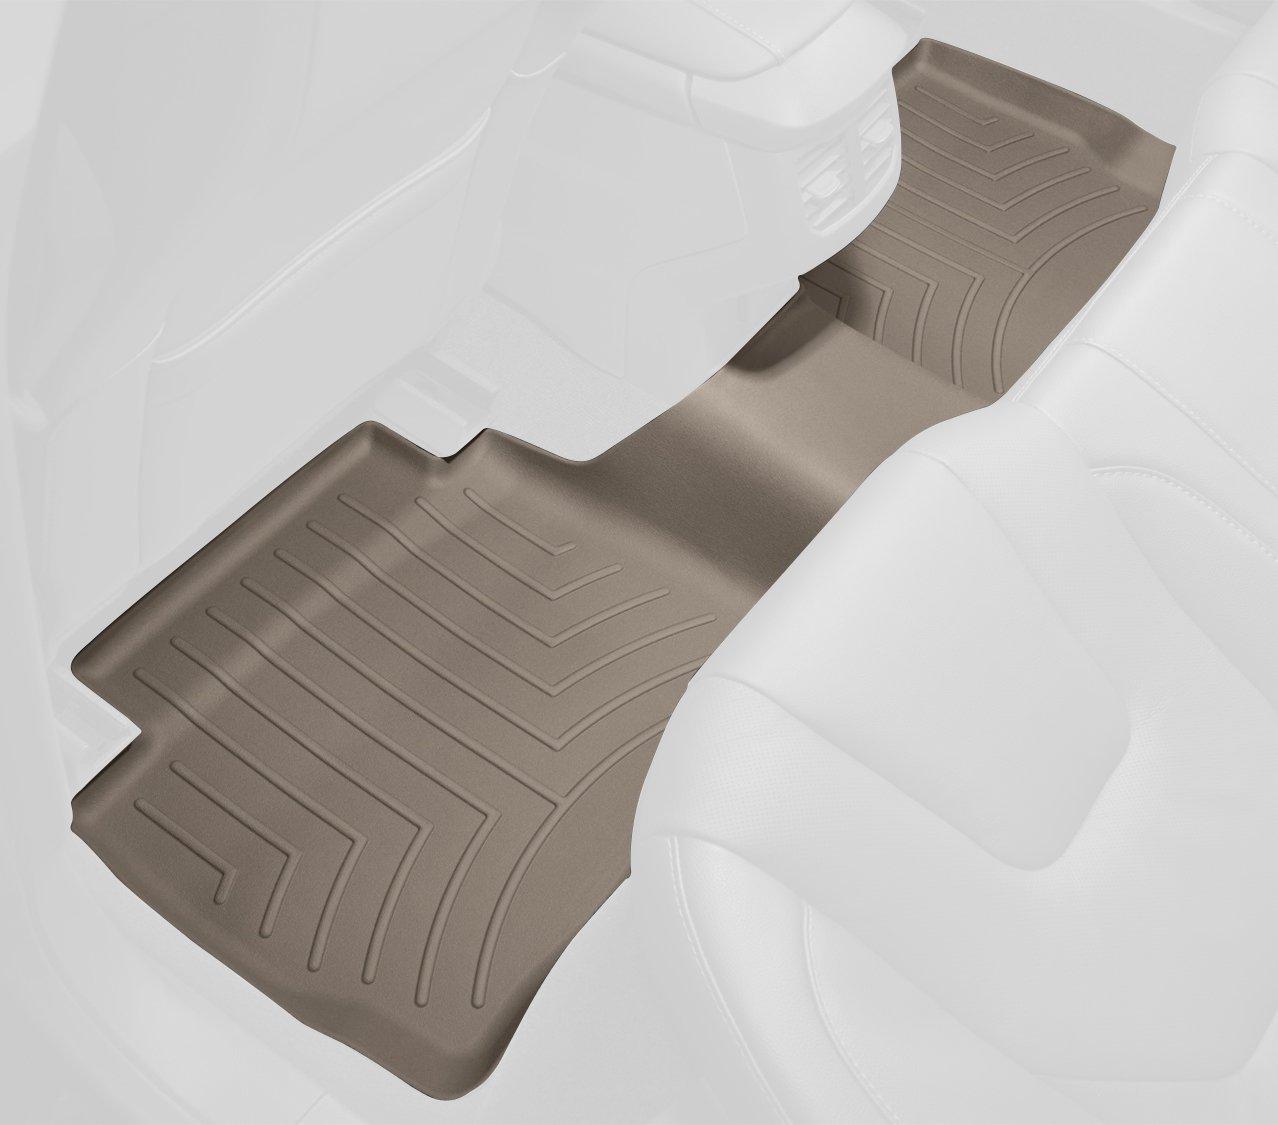 454292 FloorLiner, Rear, Tan WeatherTech